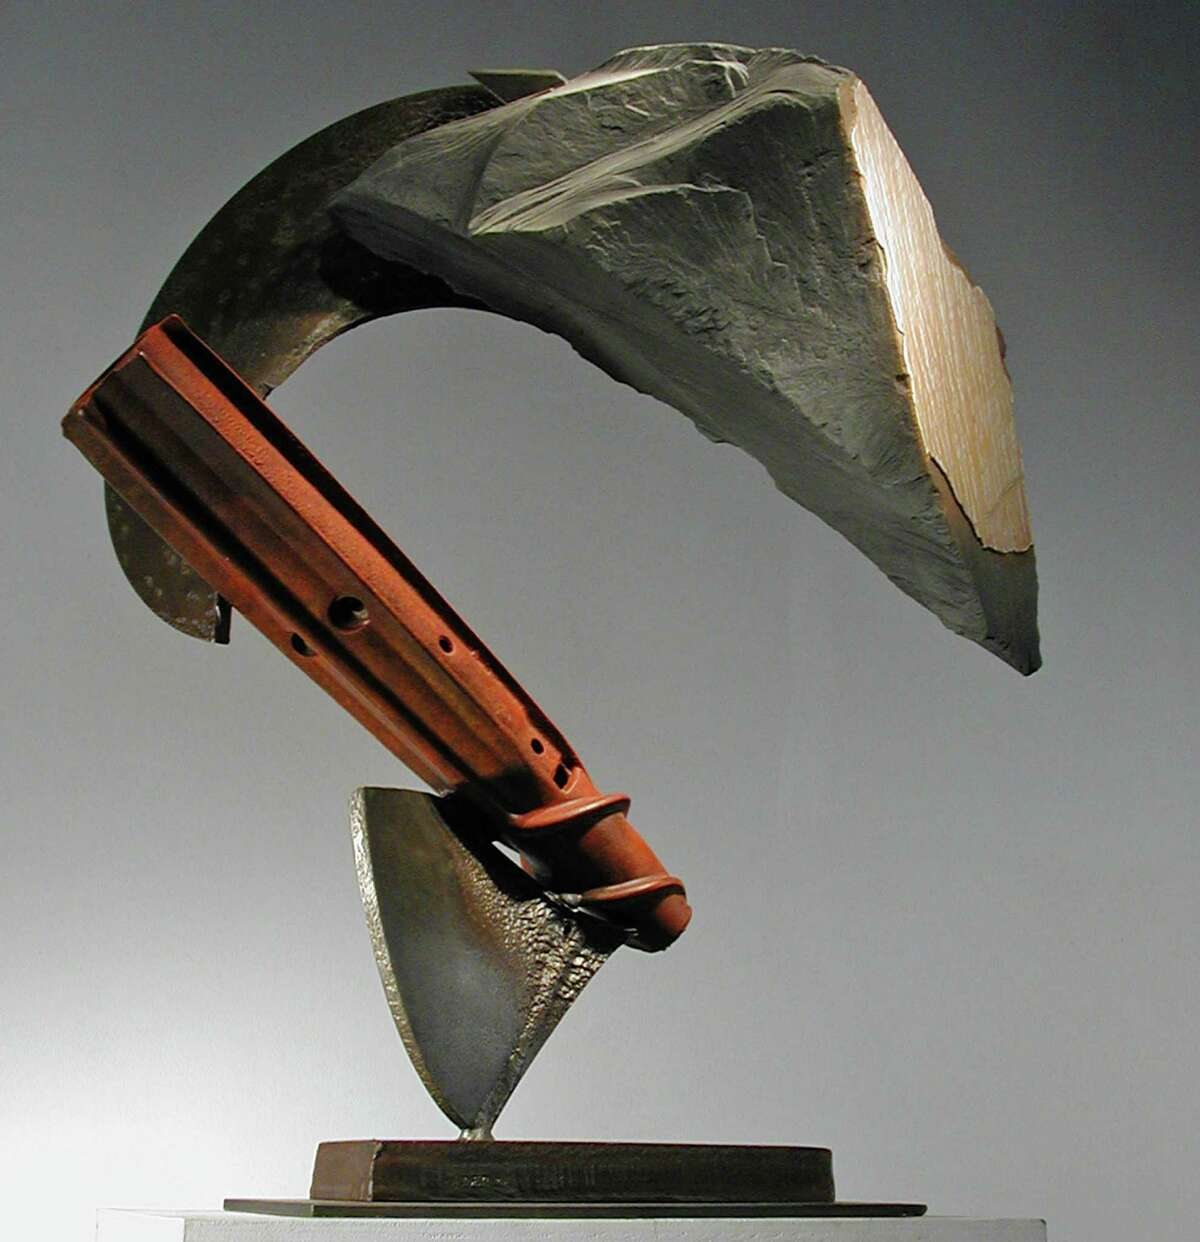 John Van Alstine's Auger '05, 2005, slate, pigmented and sealed steel, 34